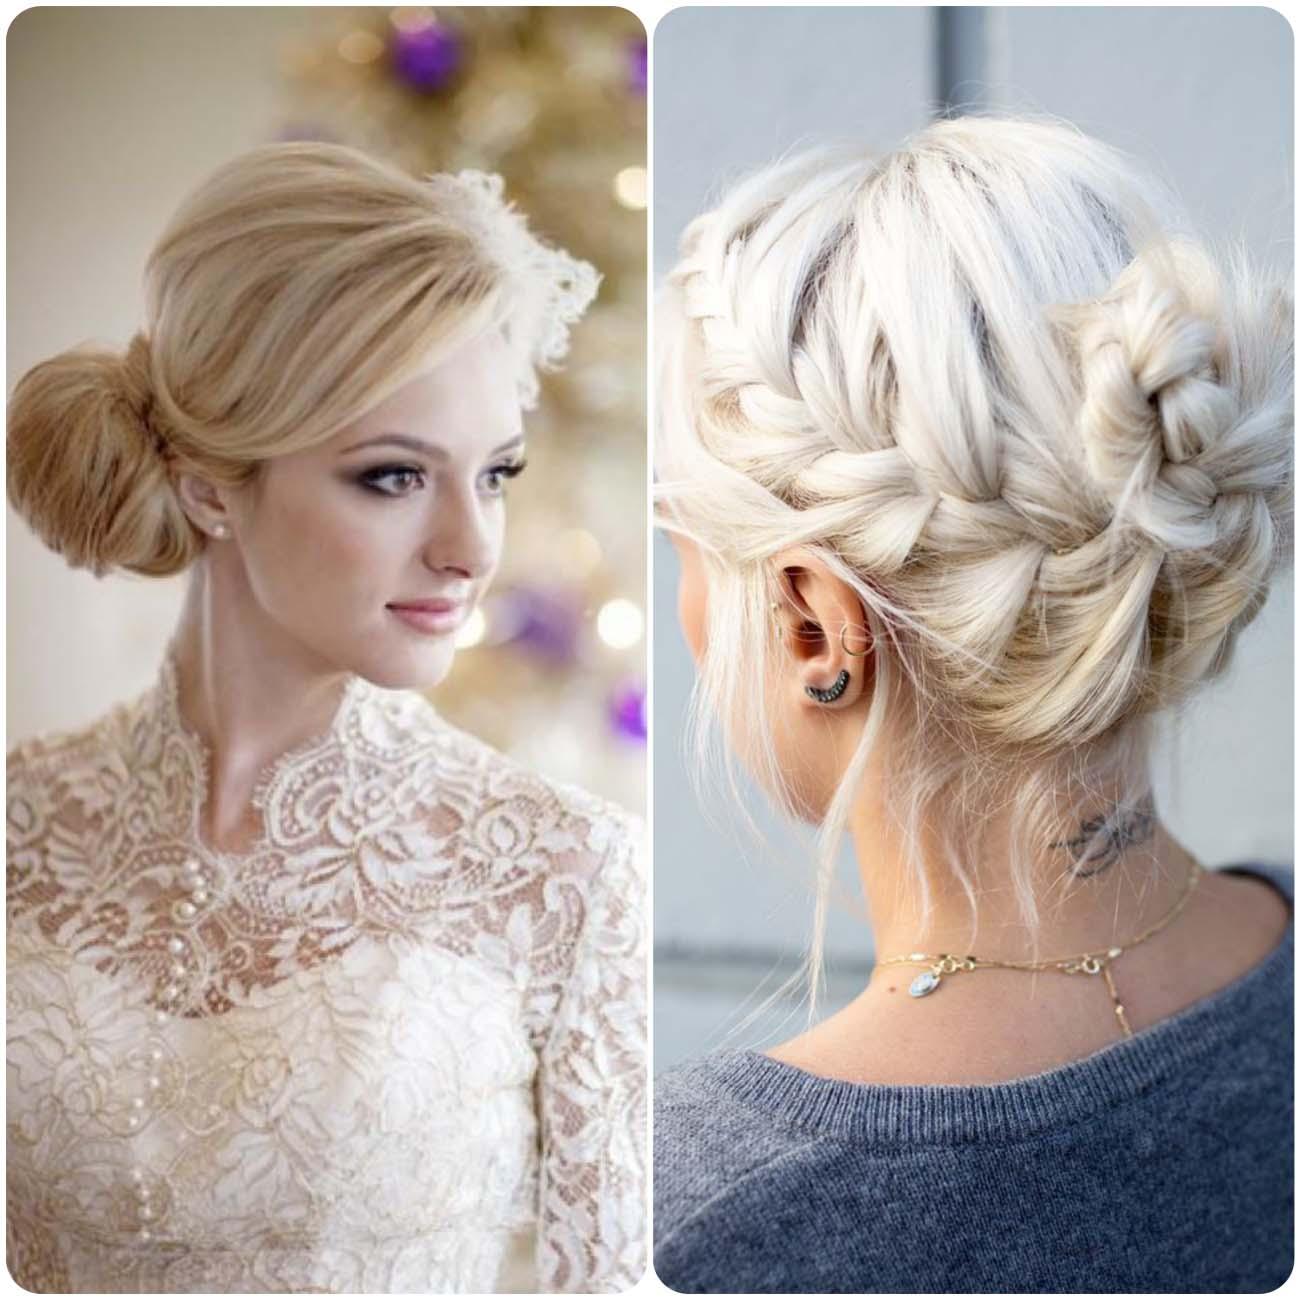 lfg-fall-2012-ny-fashion-week-runway-hair-bstyles-3_Fotor_Collage